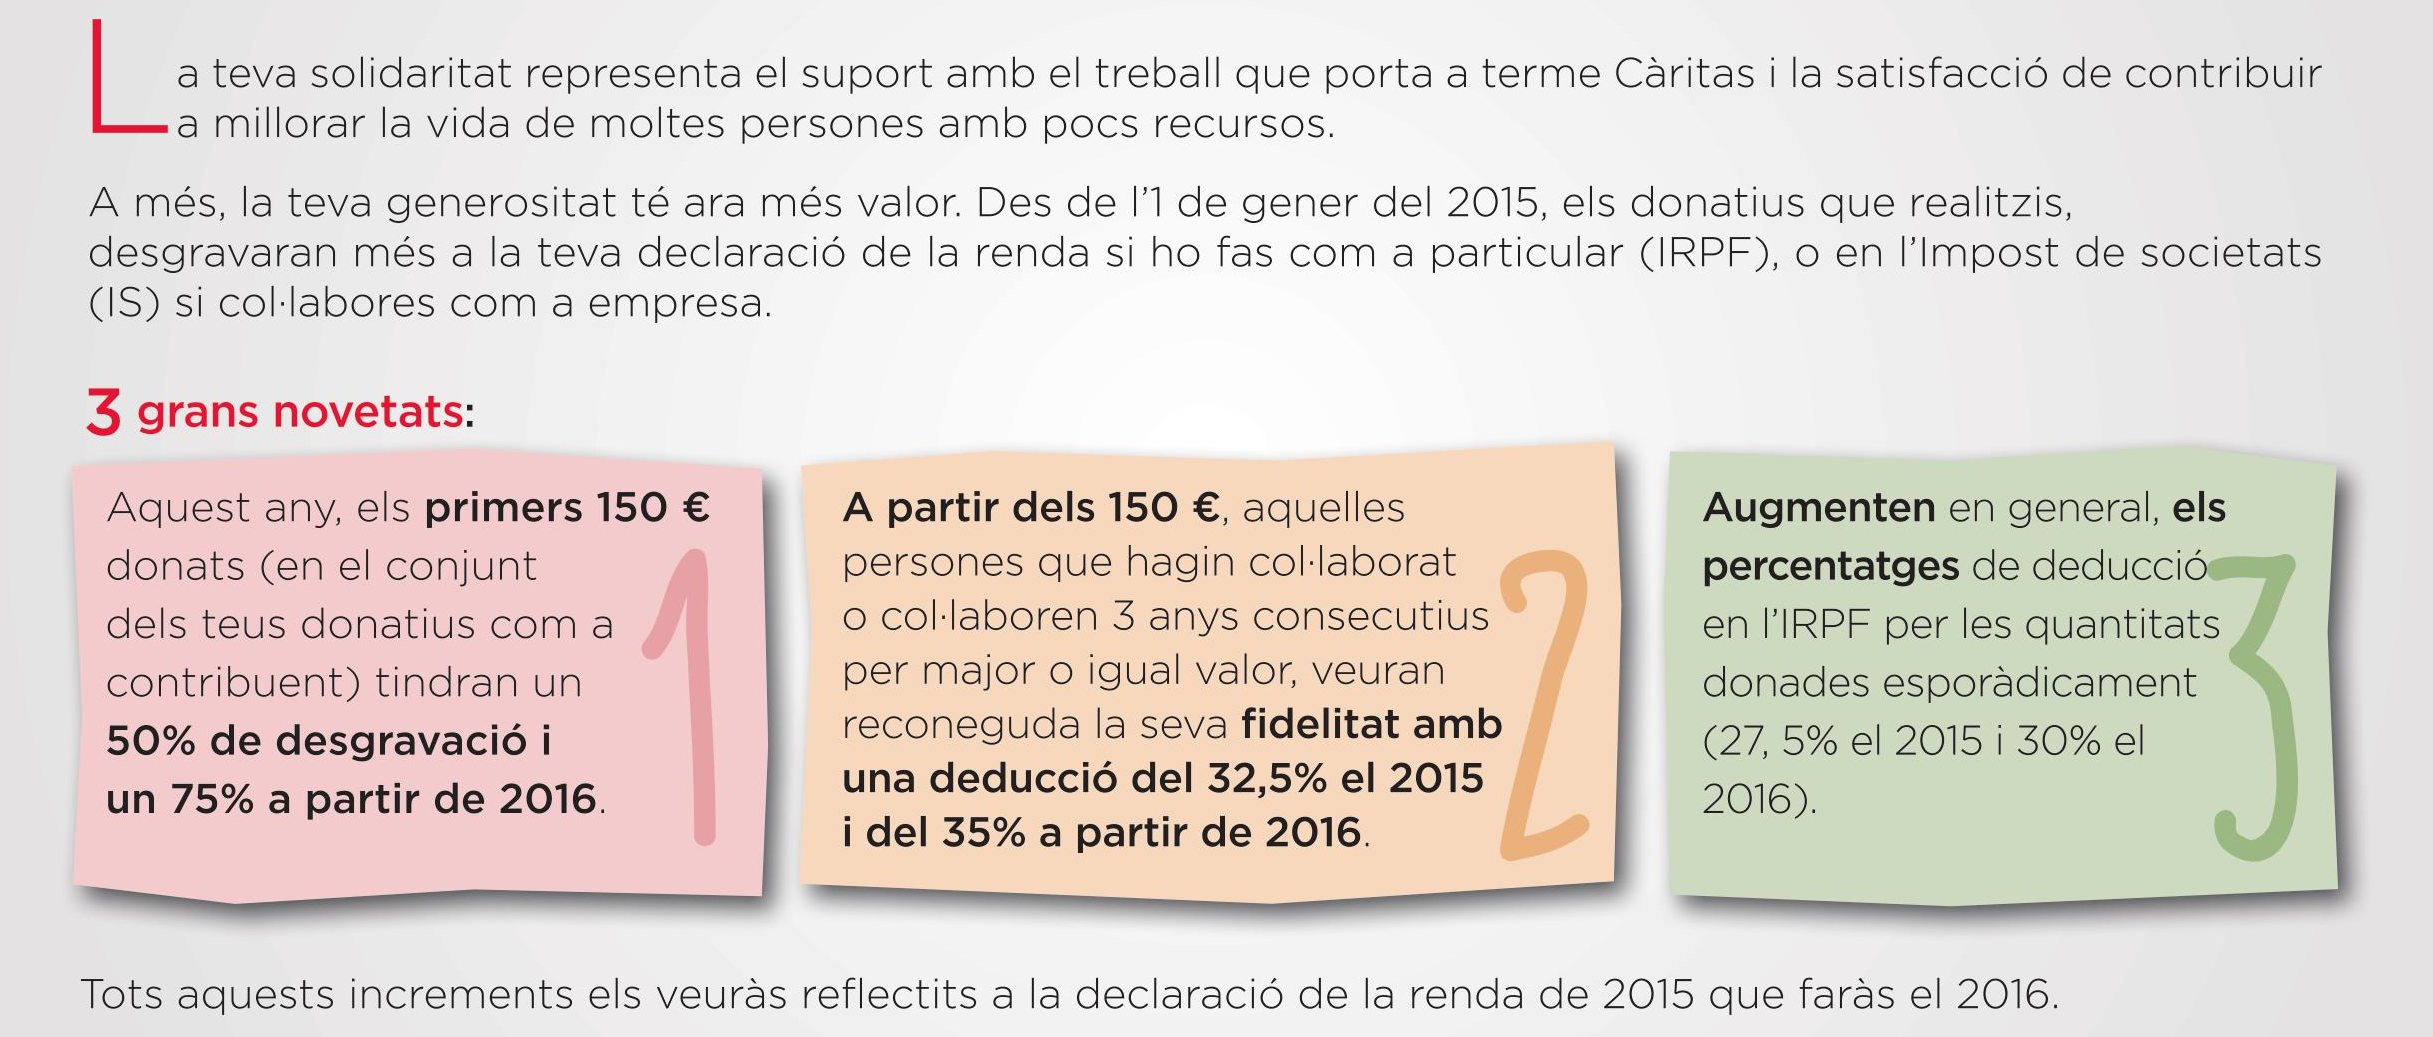 Donacions c ritas diocesana de tarragona for Oficina 0049 banco santander